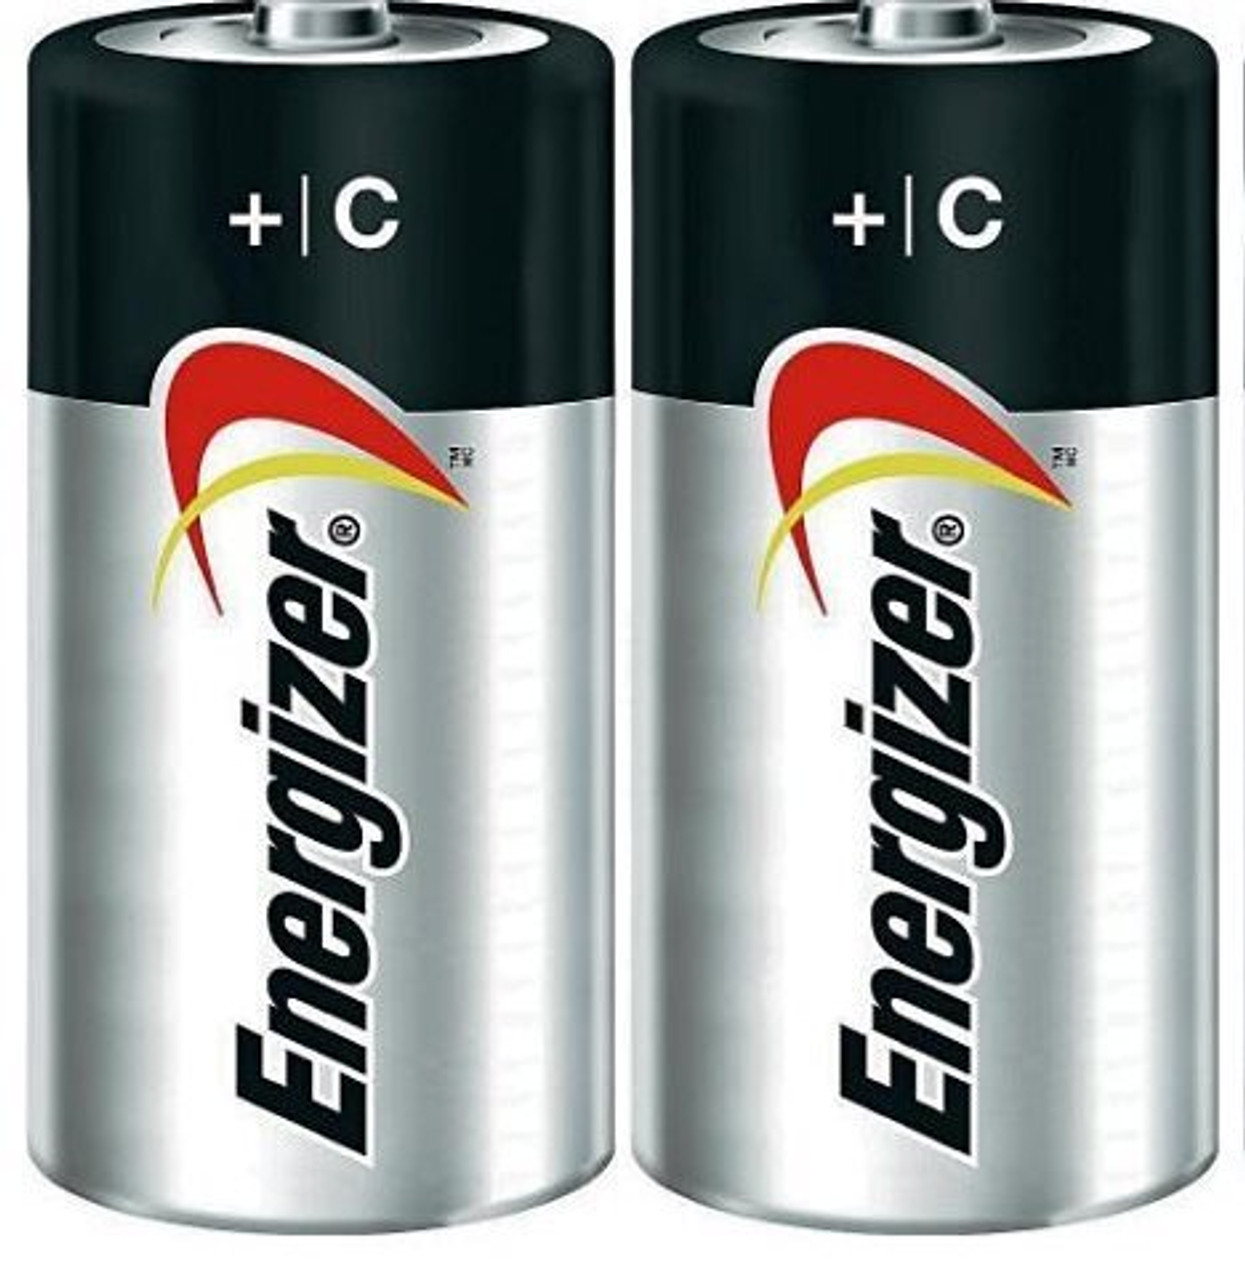 C Size Batteries, 2 pack